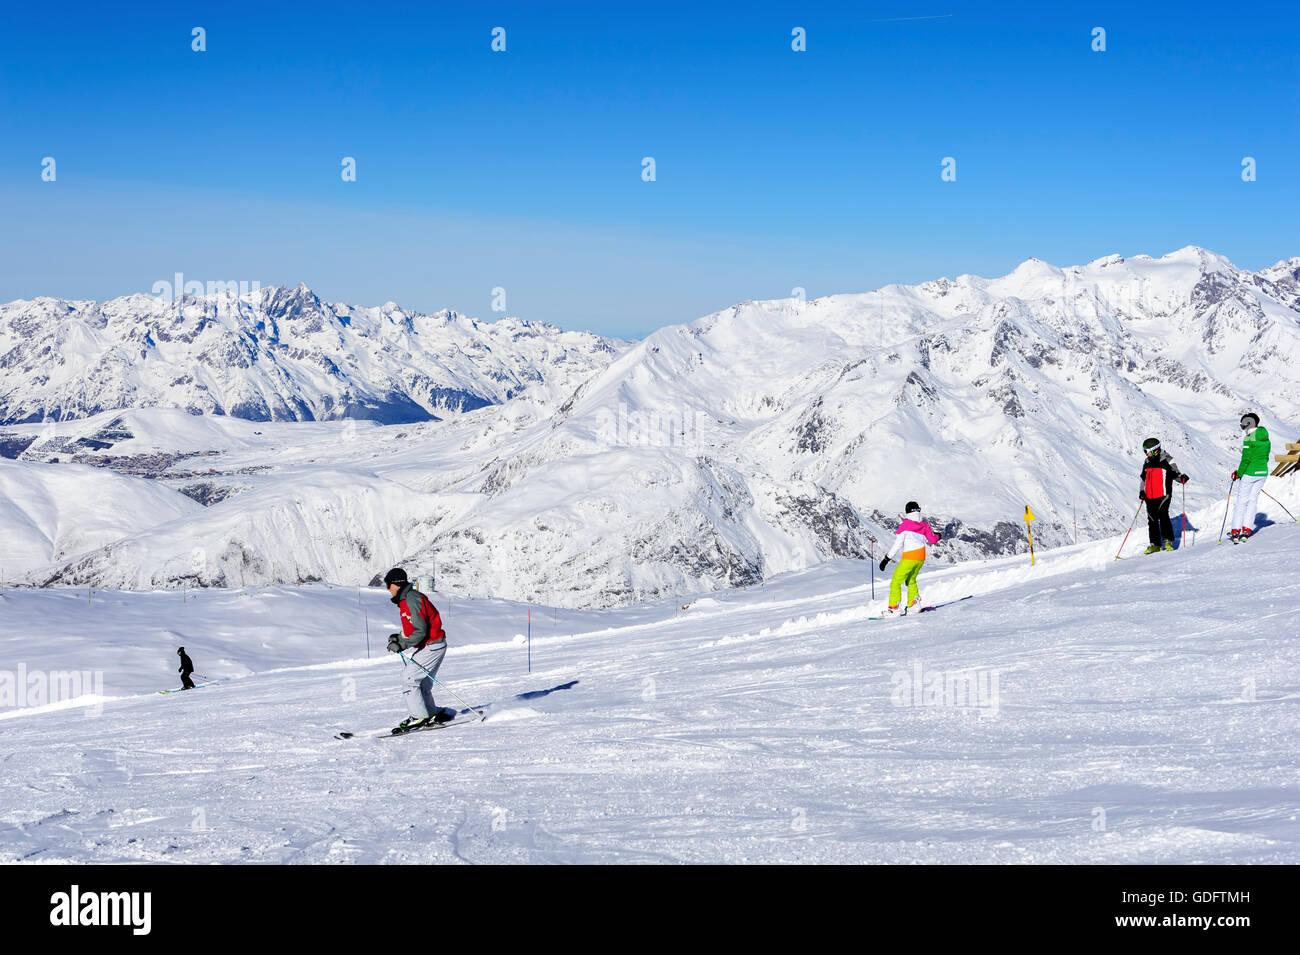 People skiing, ski resort 'Les Deux Alpes', Alps, France - Stock Image